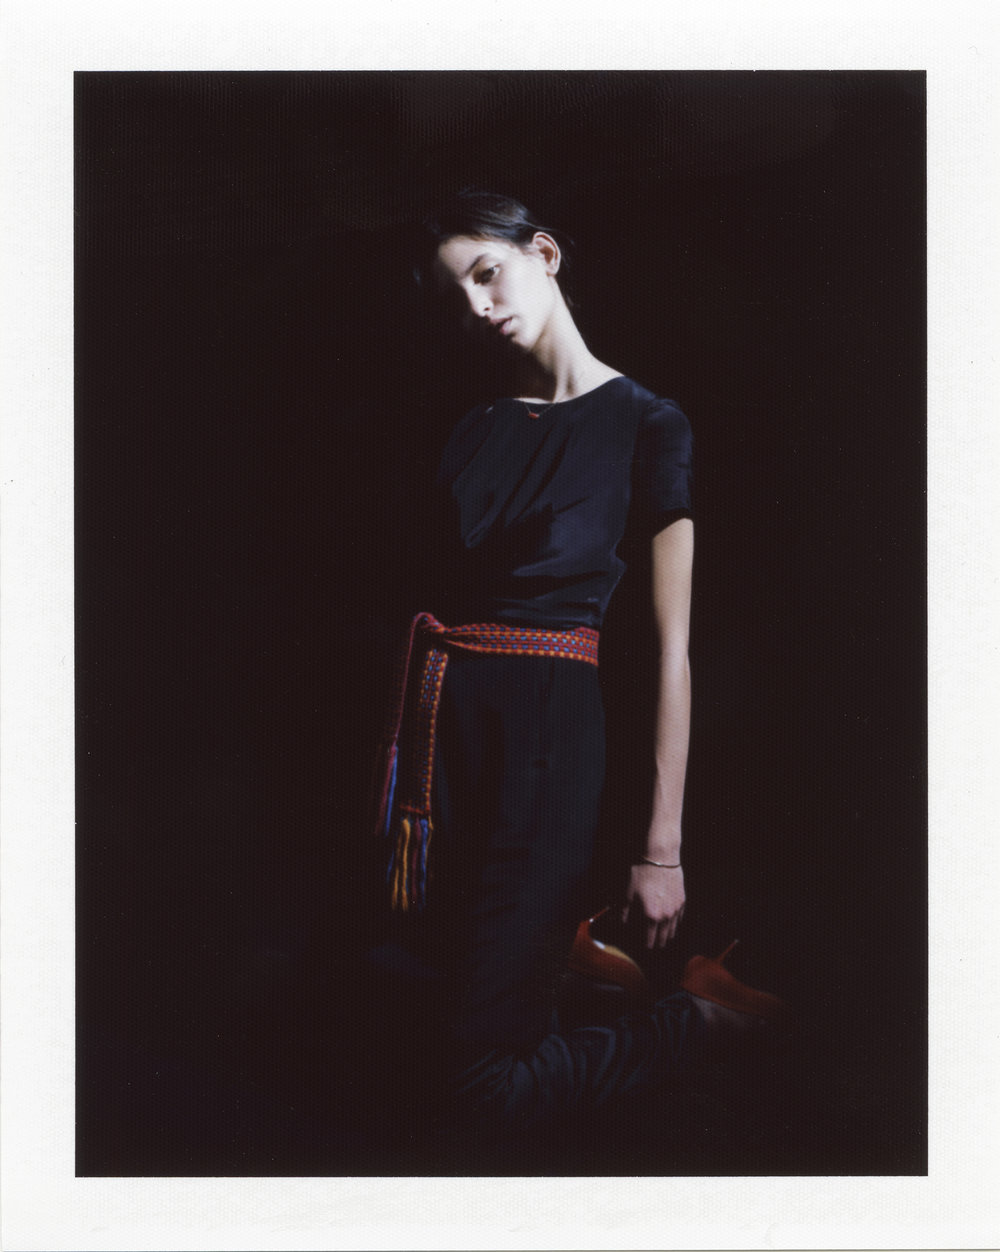 Silk dress. Red calf hair shoes RENÈ CAOVILLA,woven belt FRANCO JACASSI VINTAGE DELIRIUM,9ct golden bangle and coral and golden necklace ATELIER VM